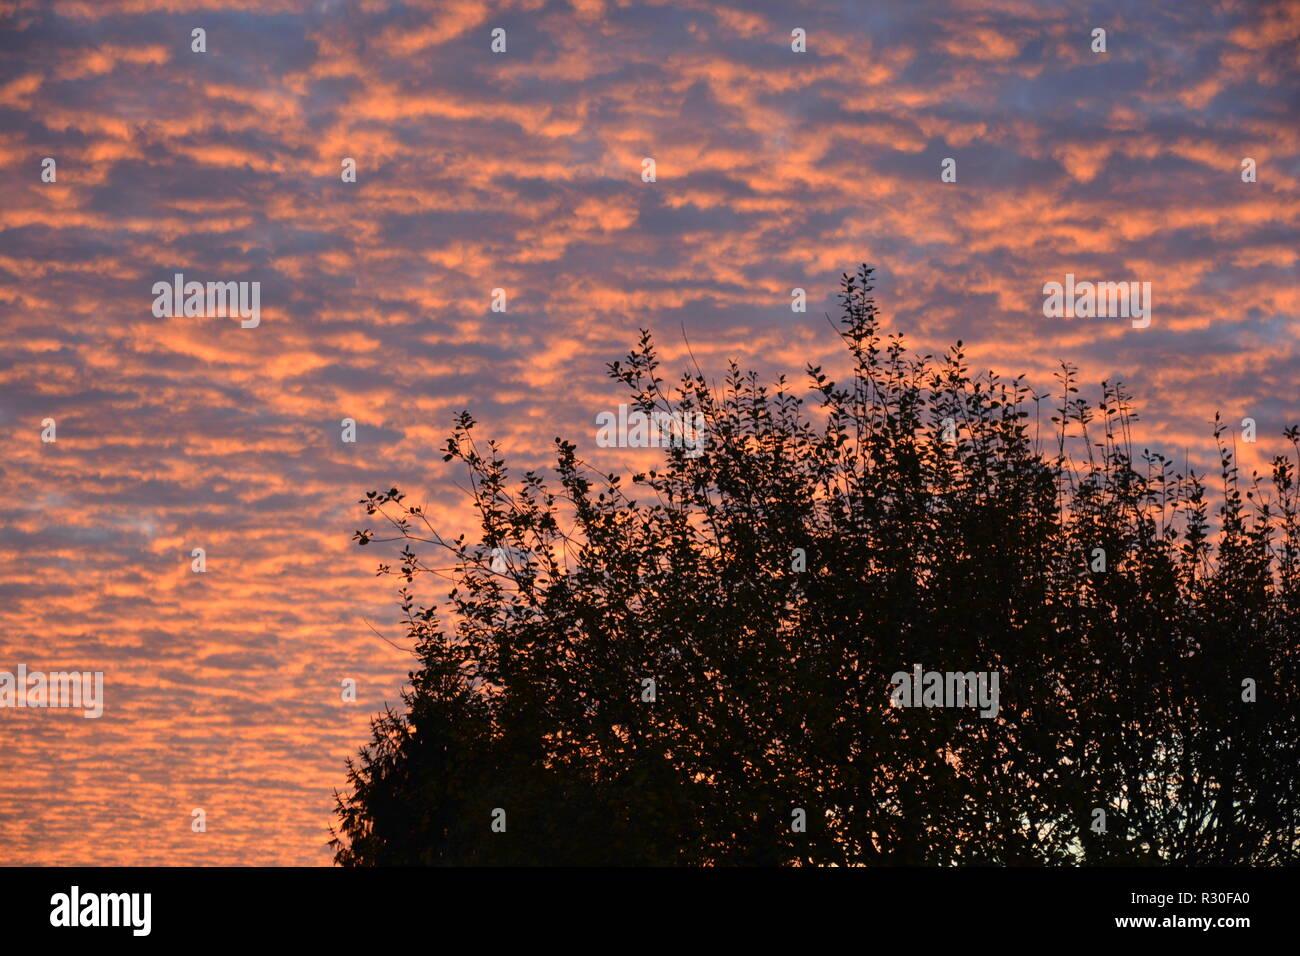 Sonnenaufgang Hintergrund Abendrot Stock Photo